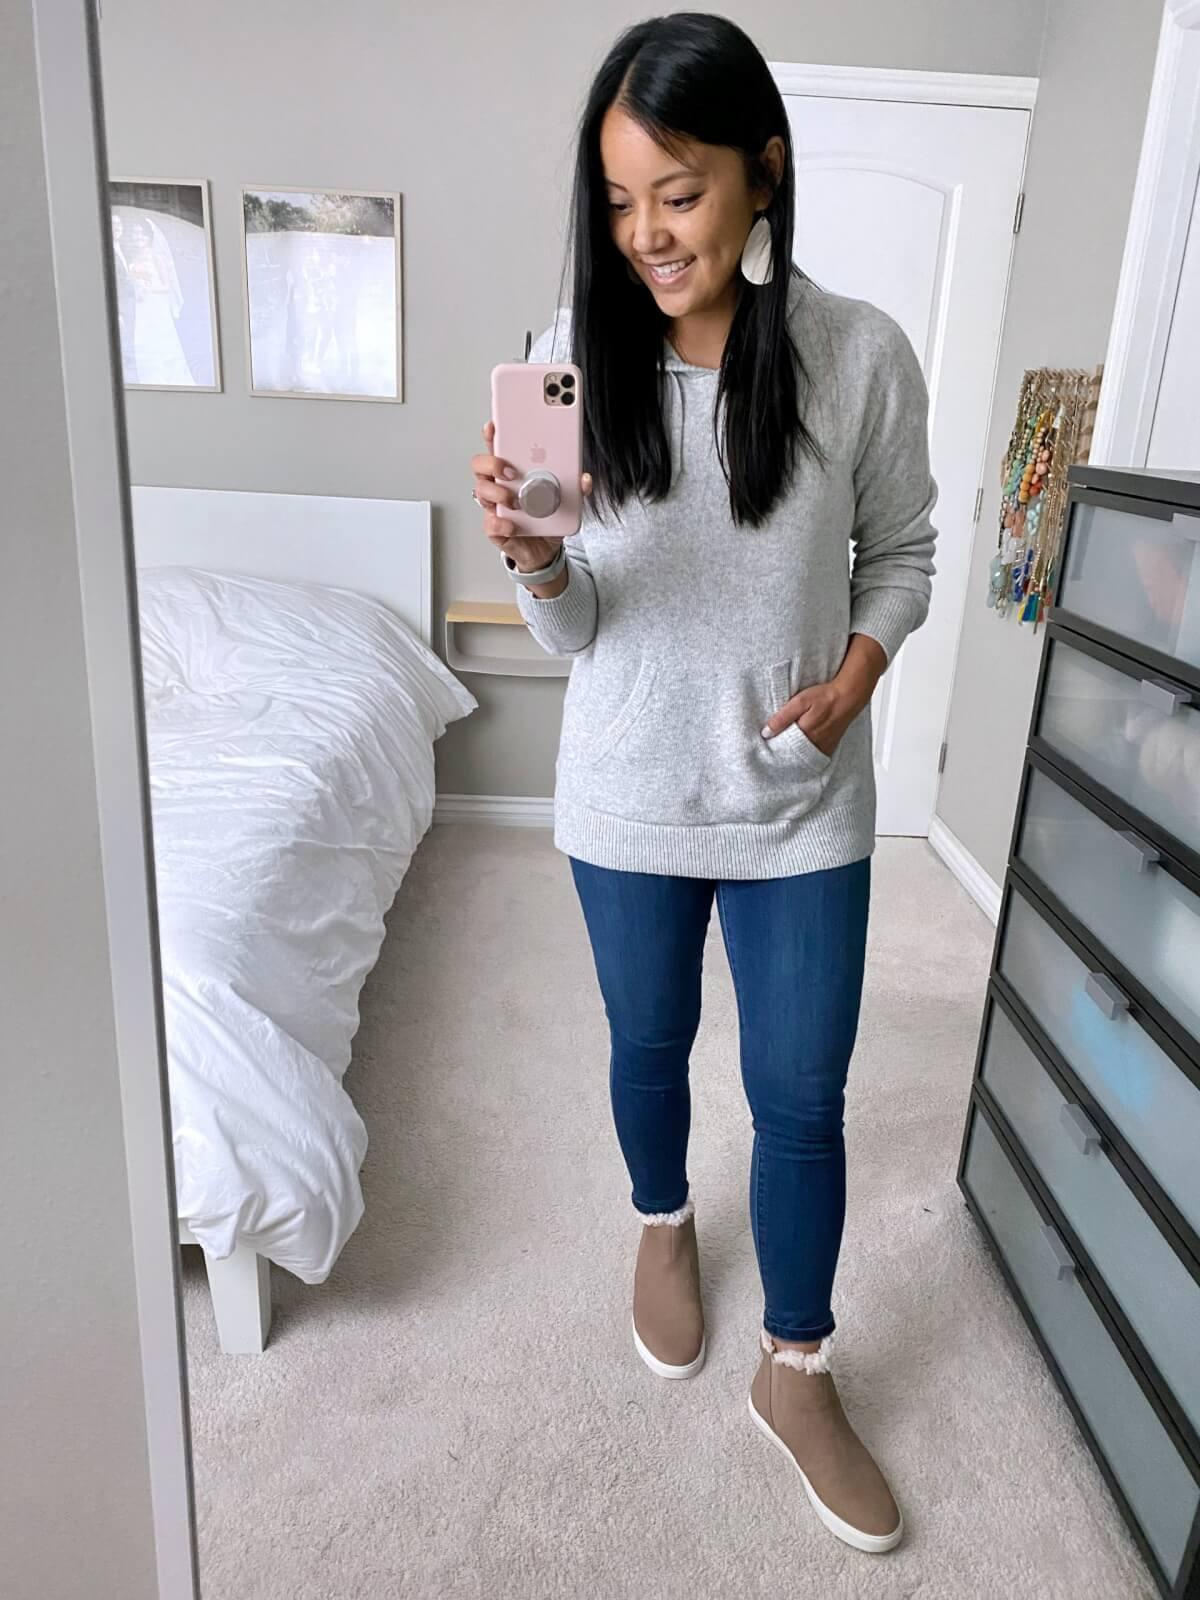 NSale Casual Outfit: gray hoodie sweatshirt + blue skinny jeans + nude shearling-lined booties + white earrings